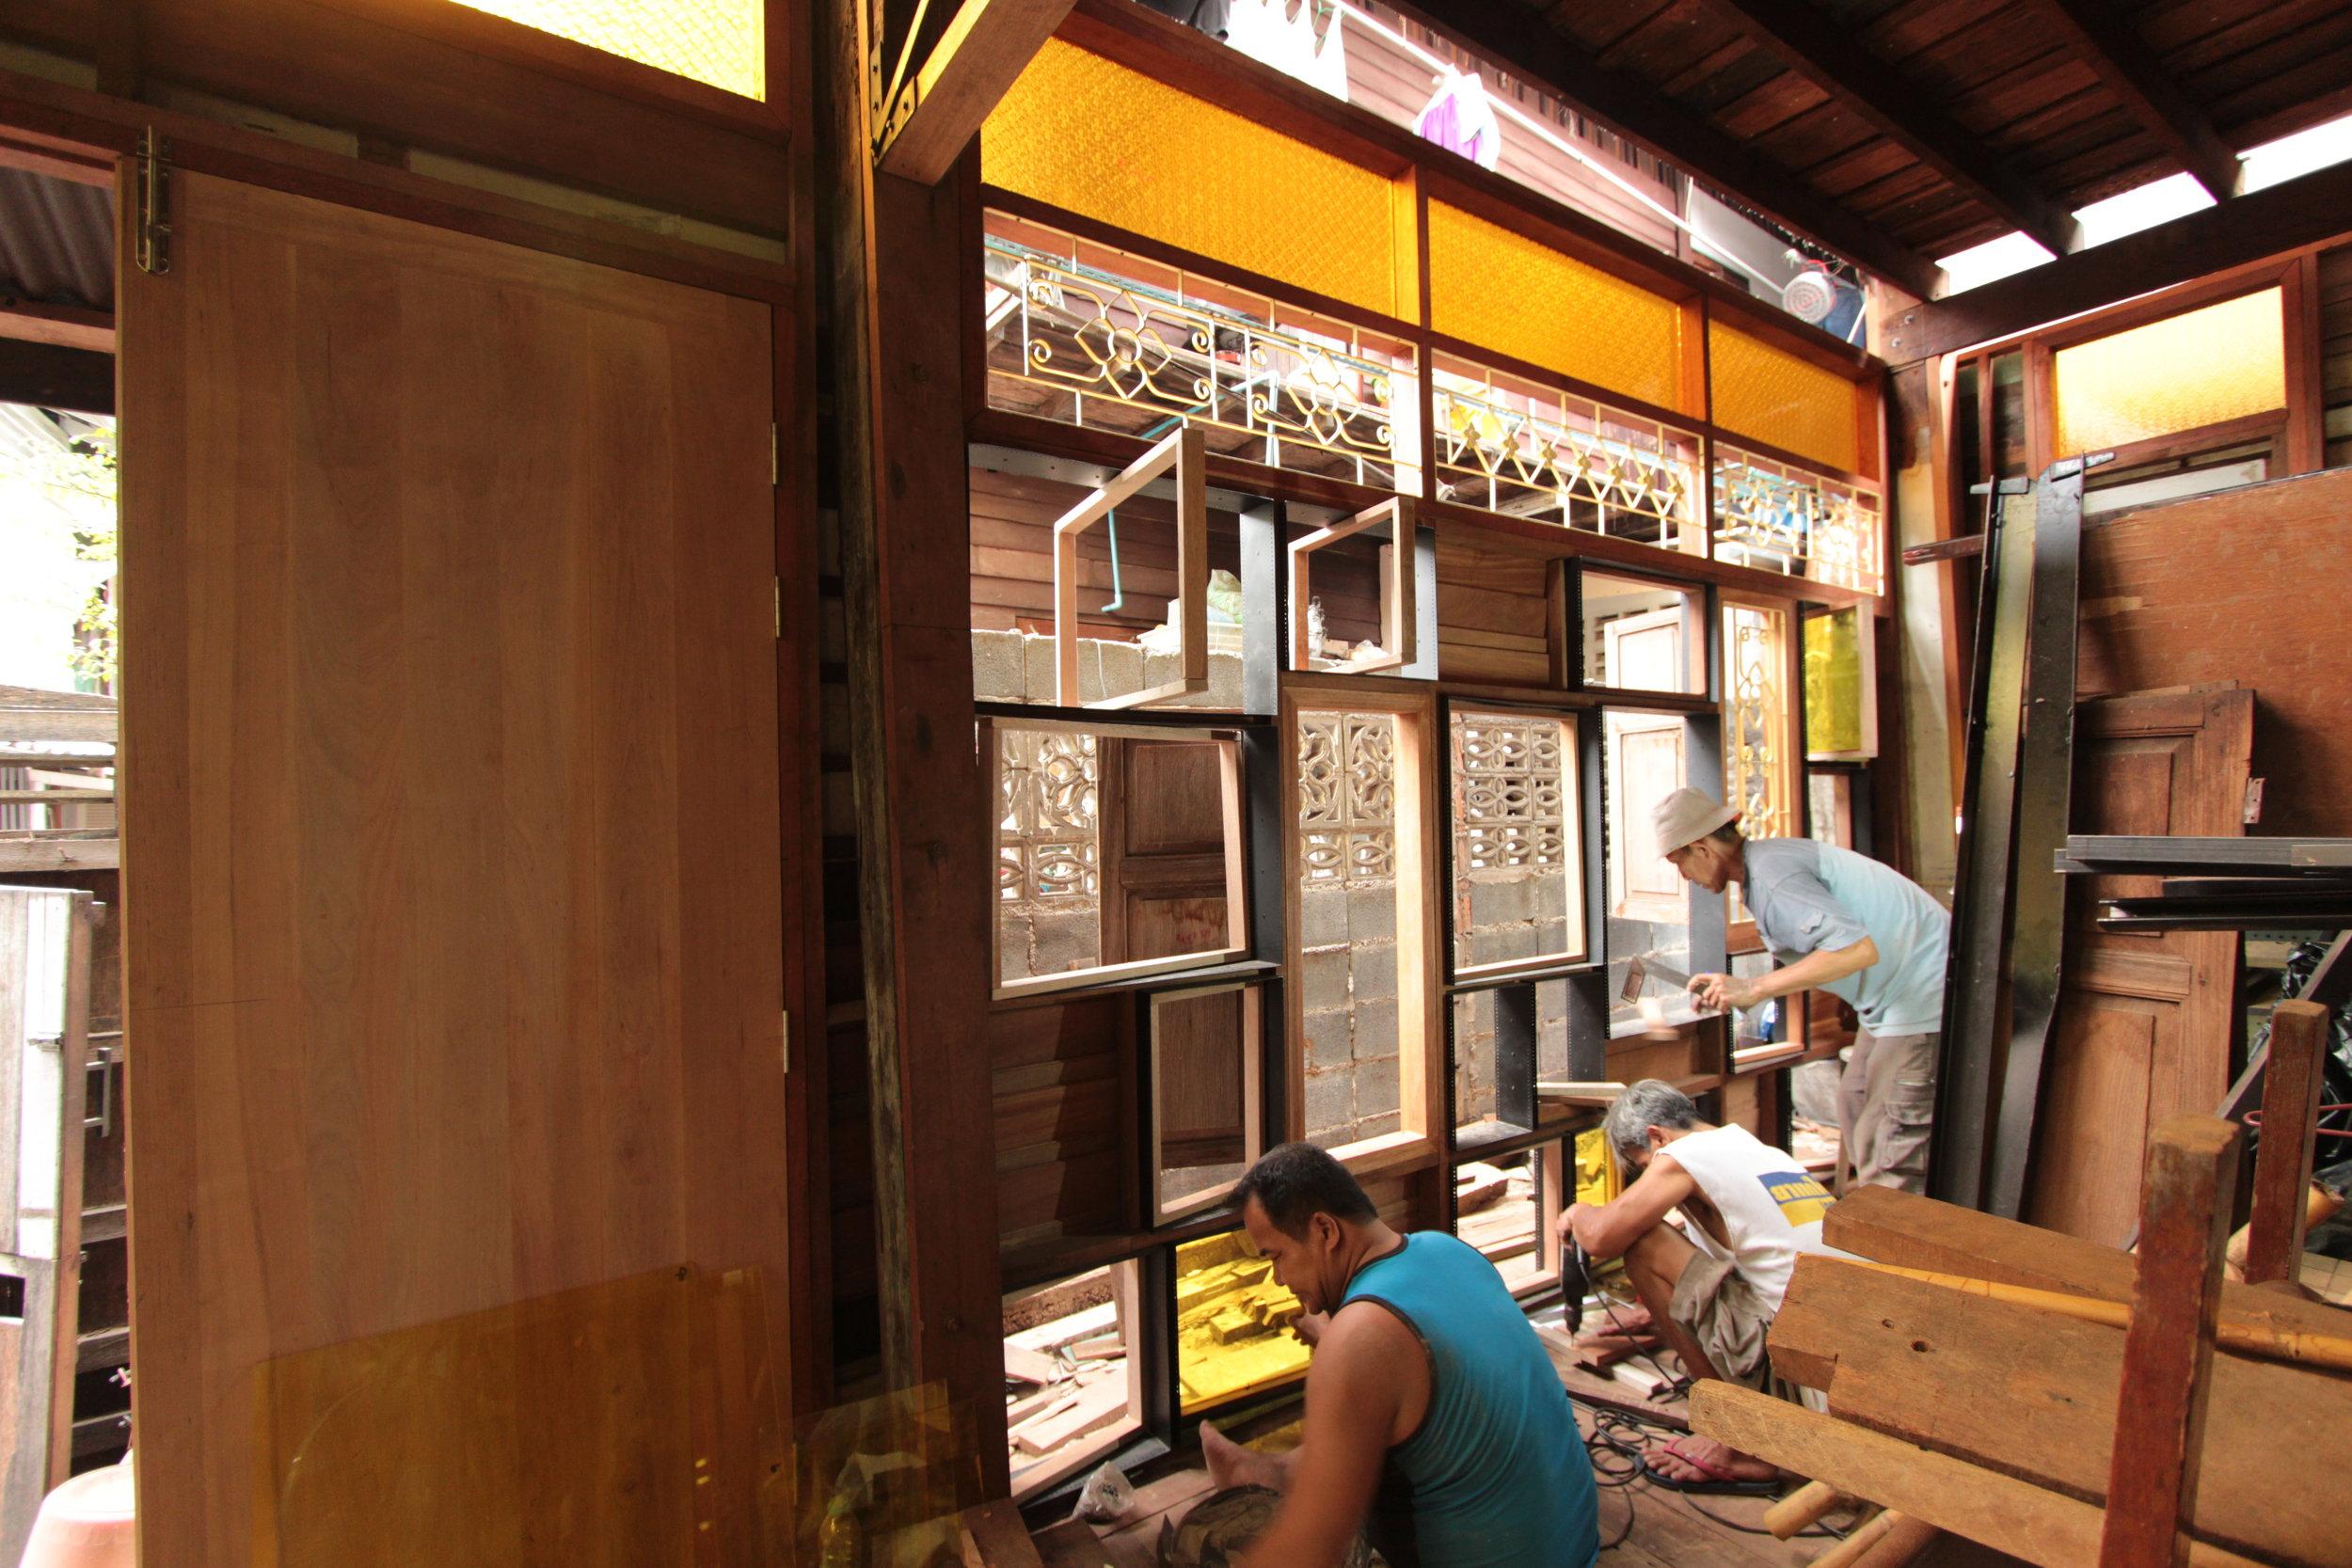 Renovating a community centre